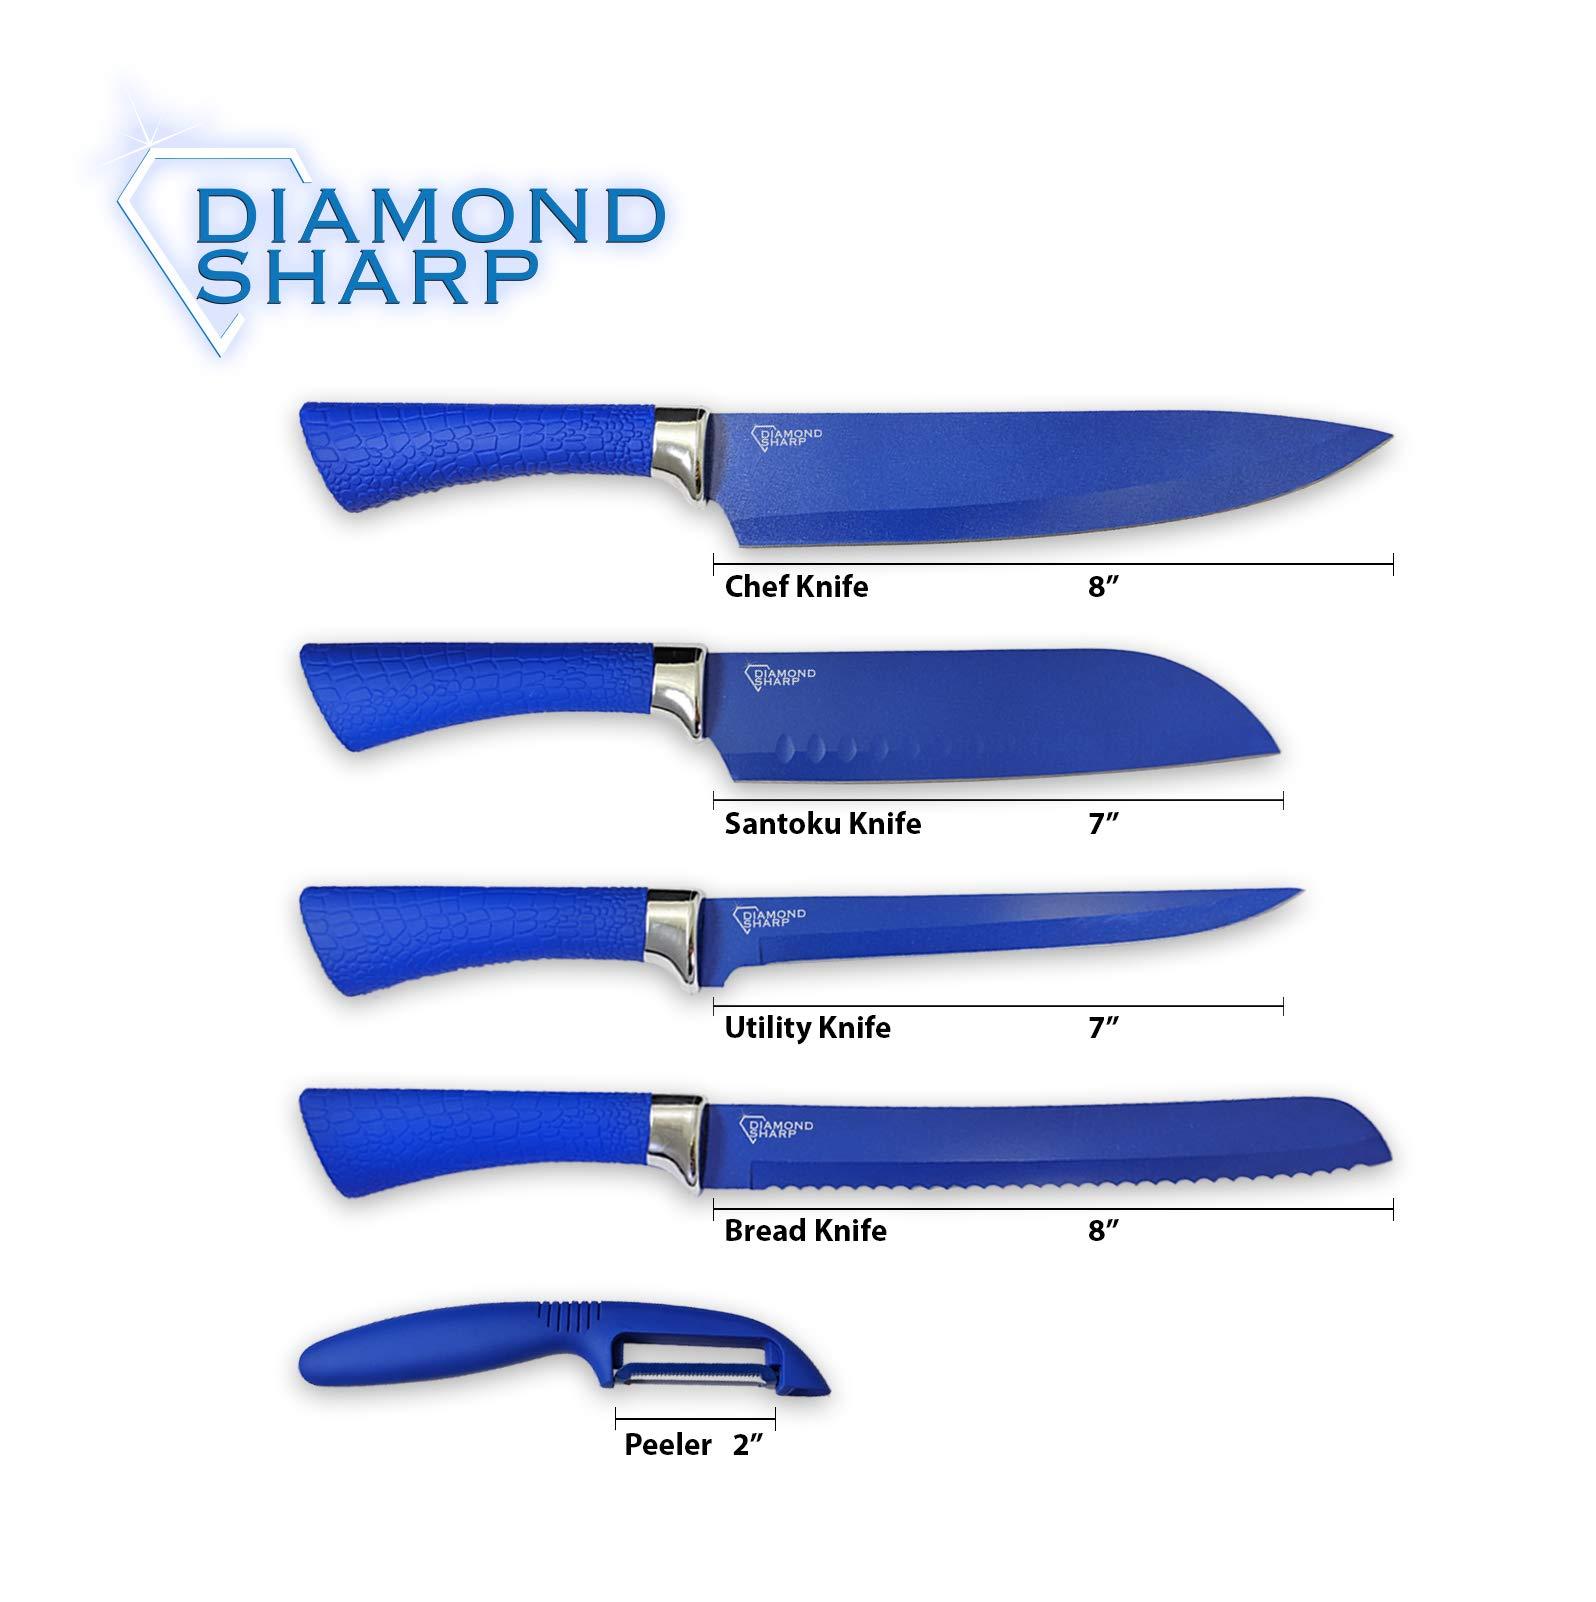 Diamond Gourmet DSMC6/DSKS 4 Pack Diamond Sharp Chef Knife Set, 1 box (4 units), Blue